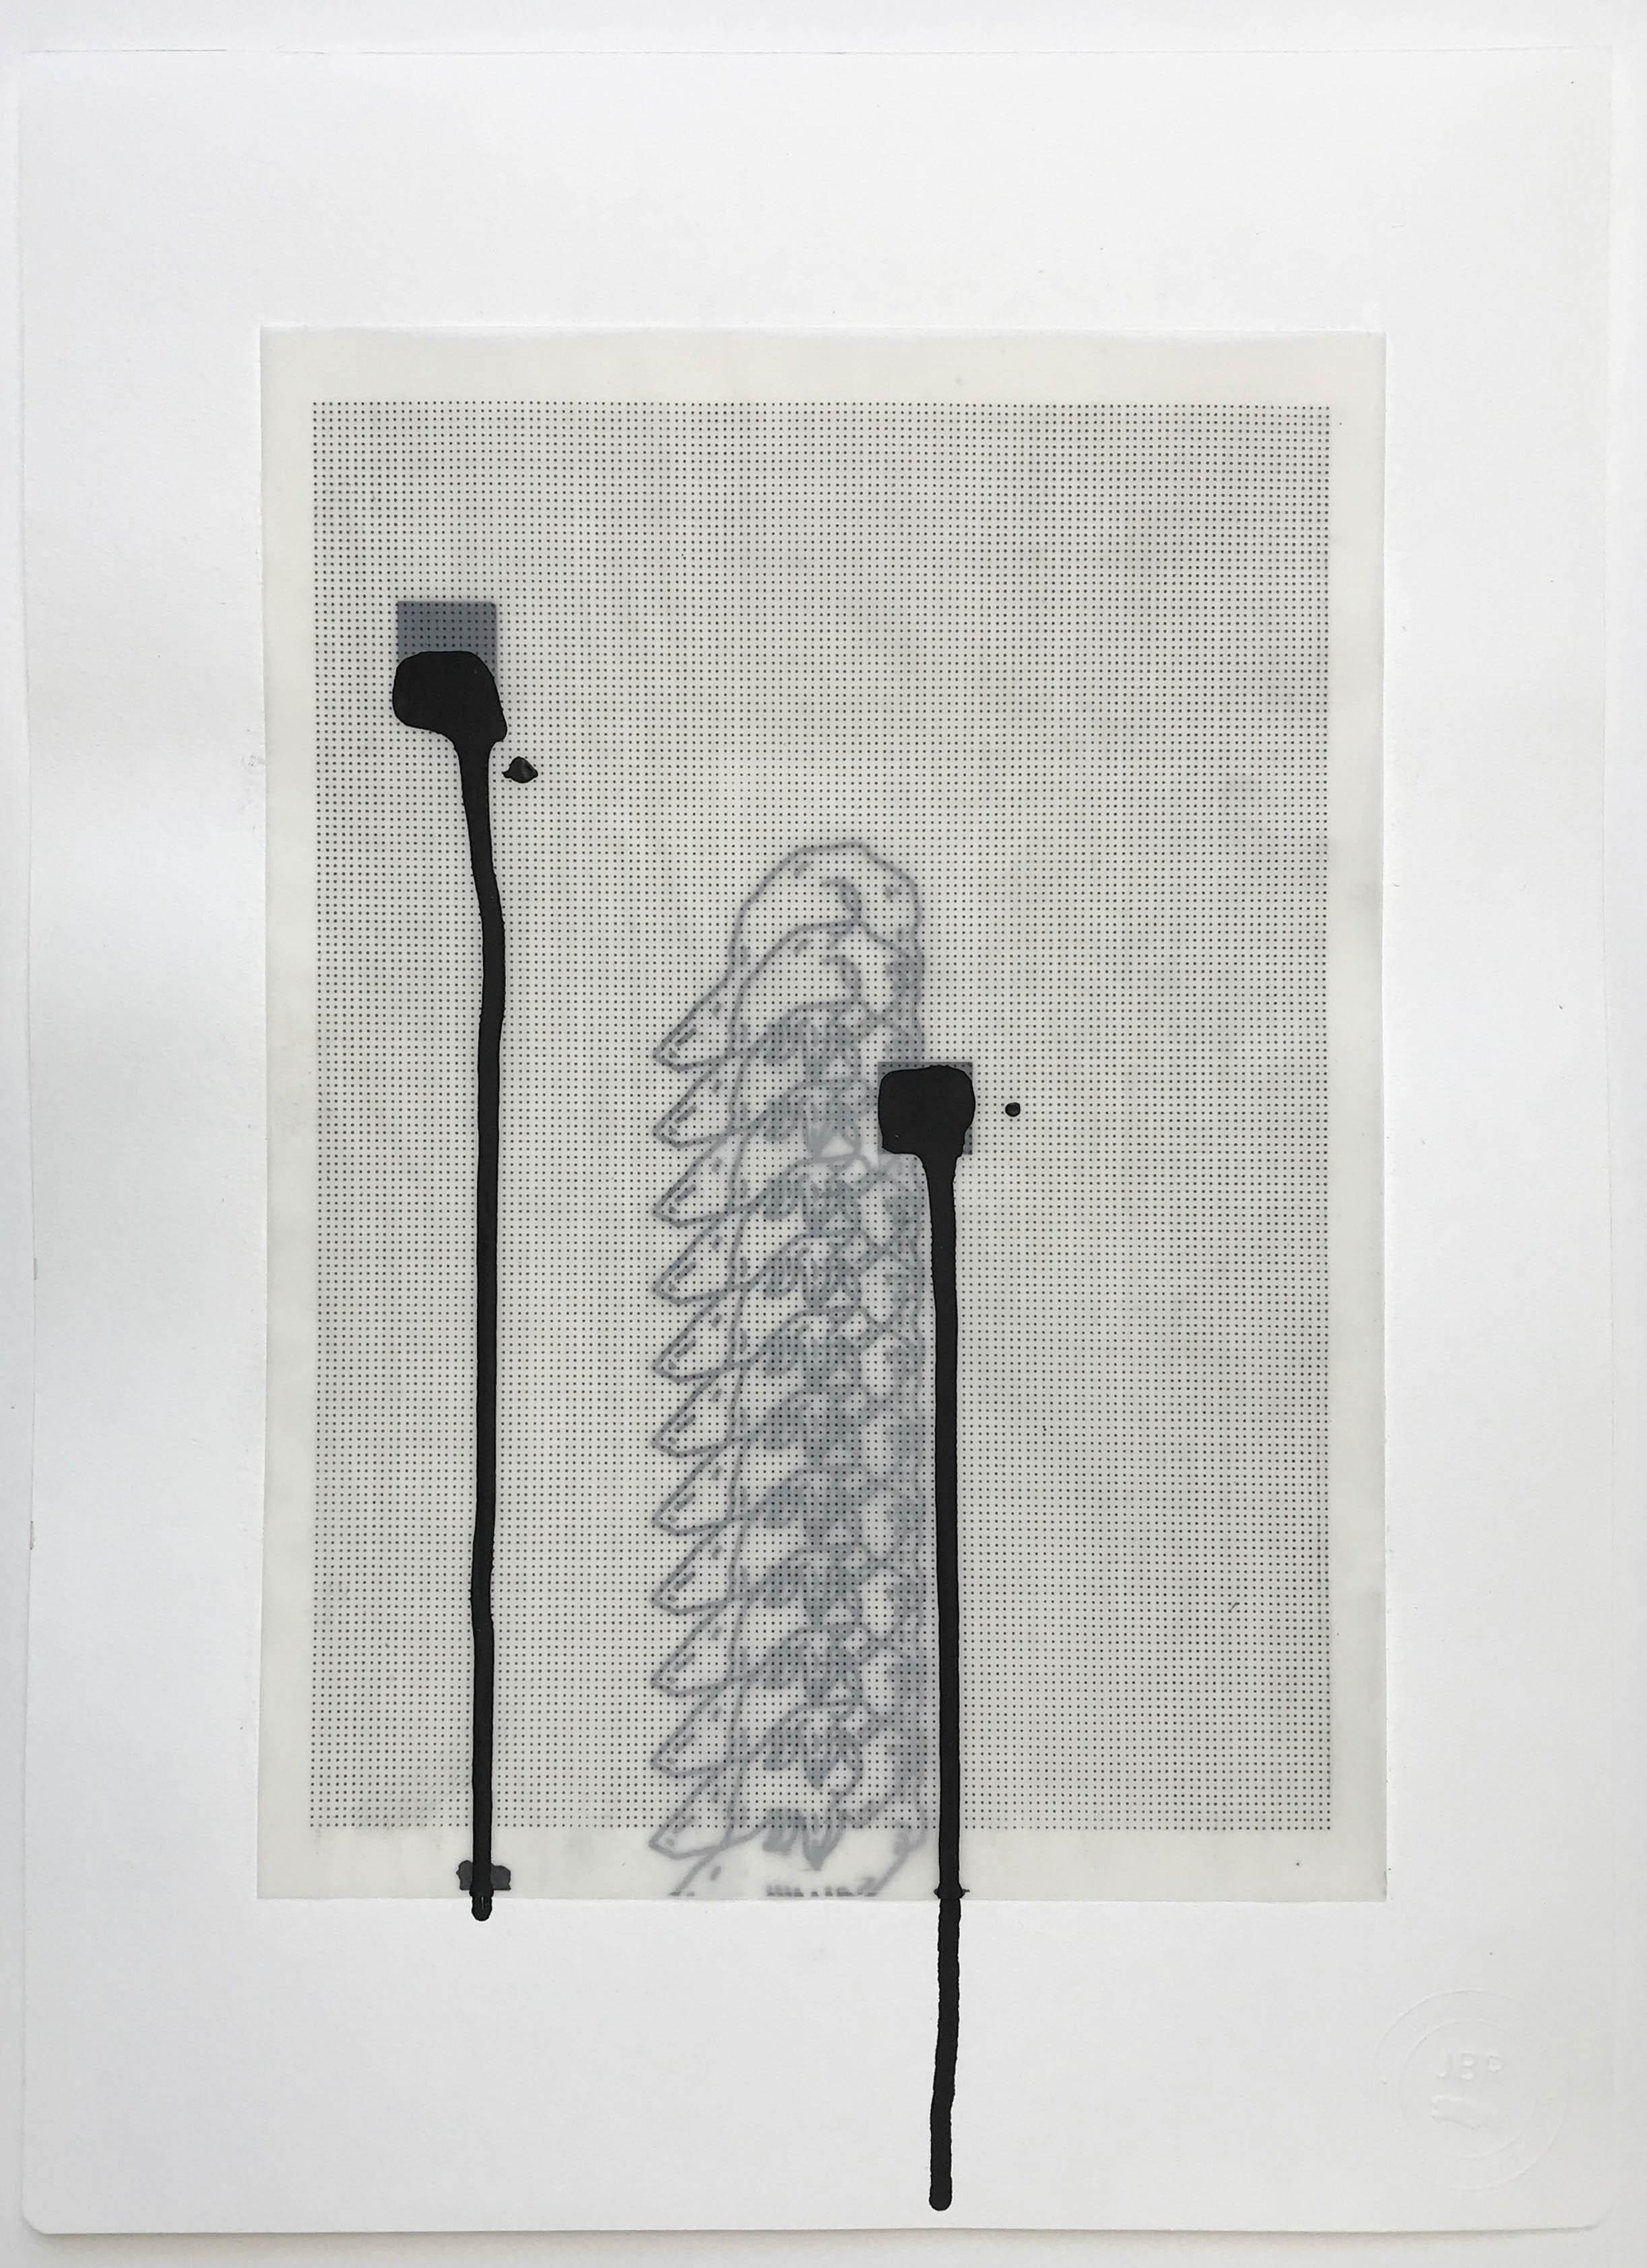 %22Estigmatizada y temida%22- Técnica mixta  - 42 x 30 cm - Julián Brangold - 2018.jpg